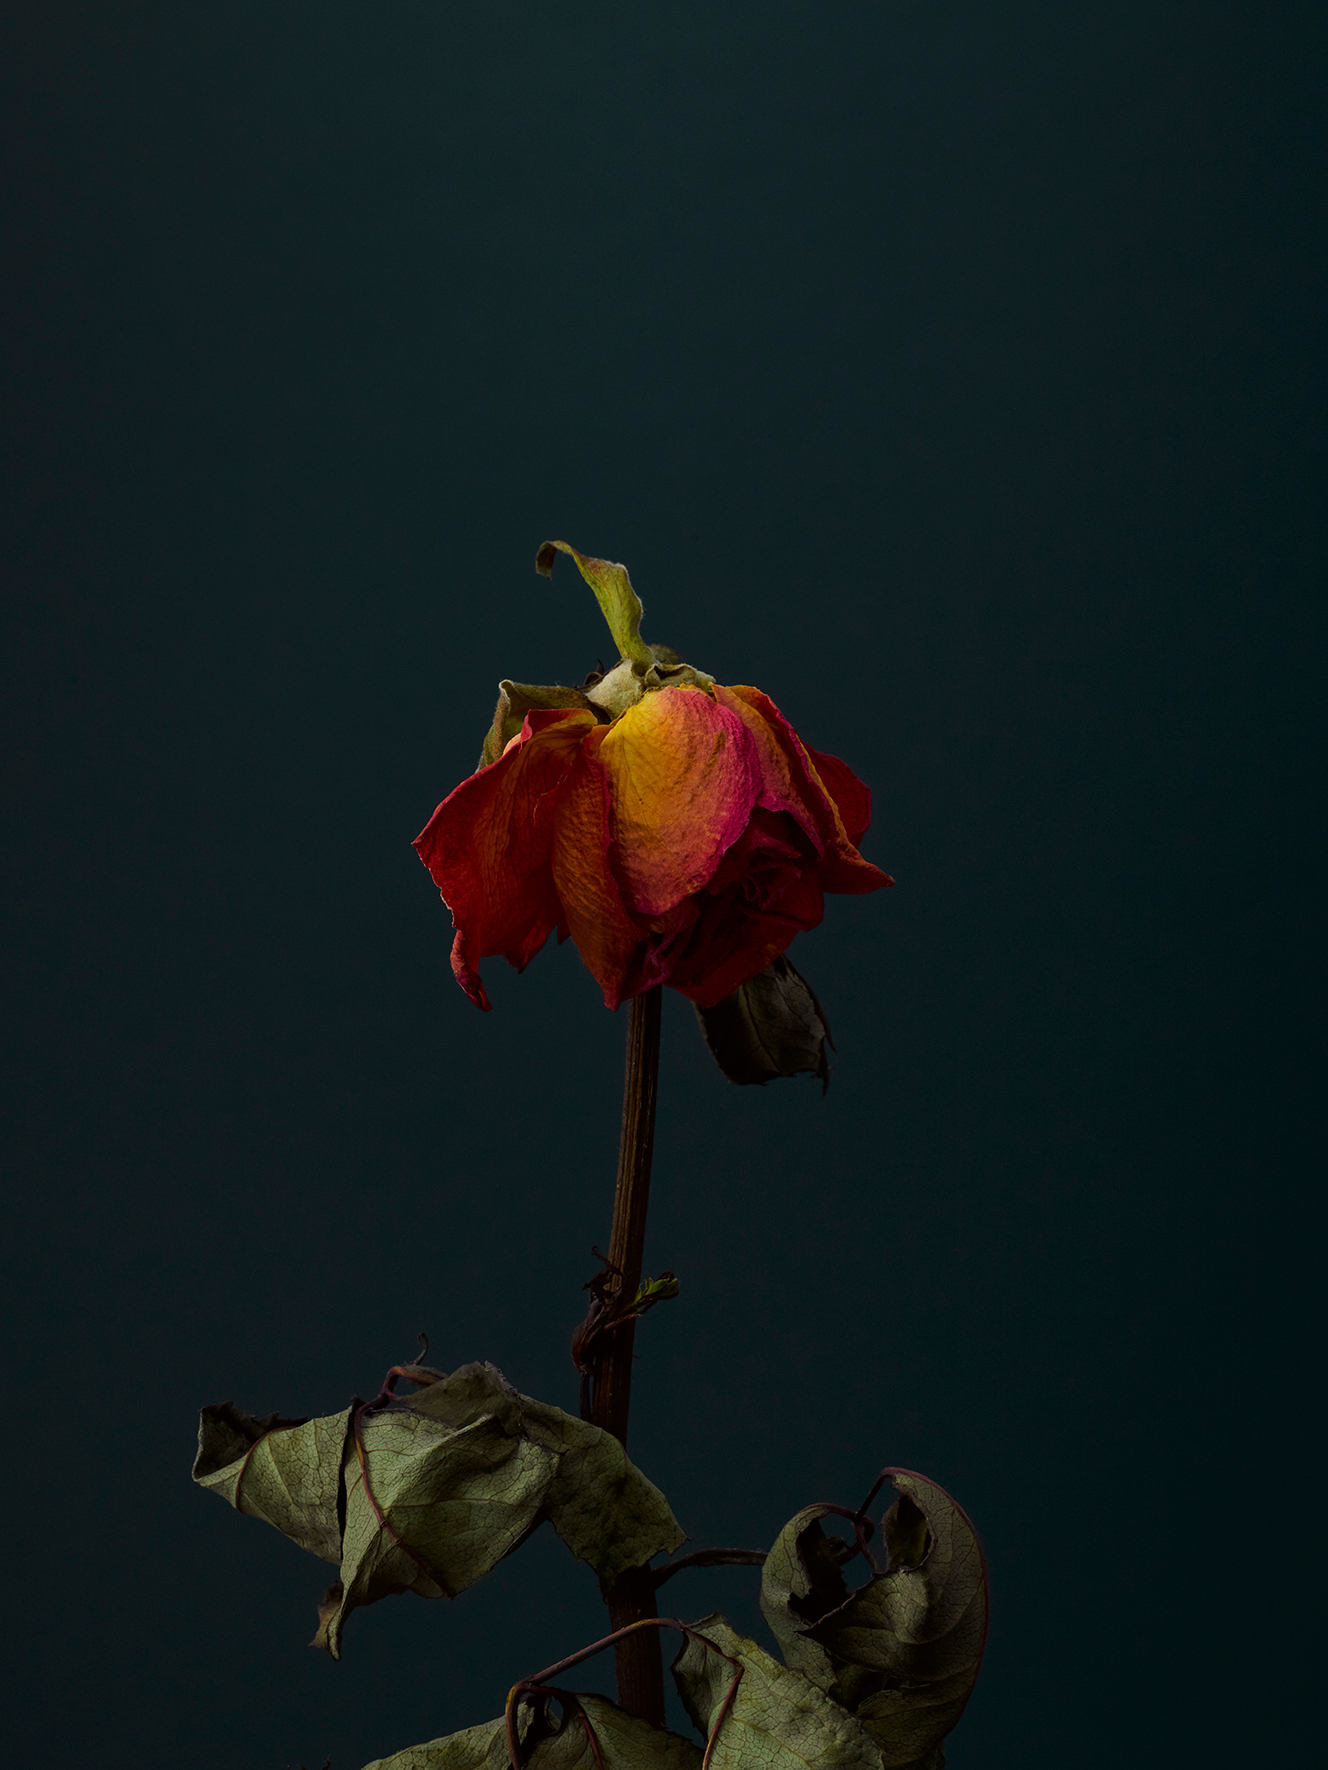 rose-11-copy.jpg